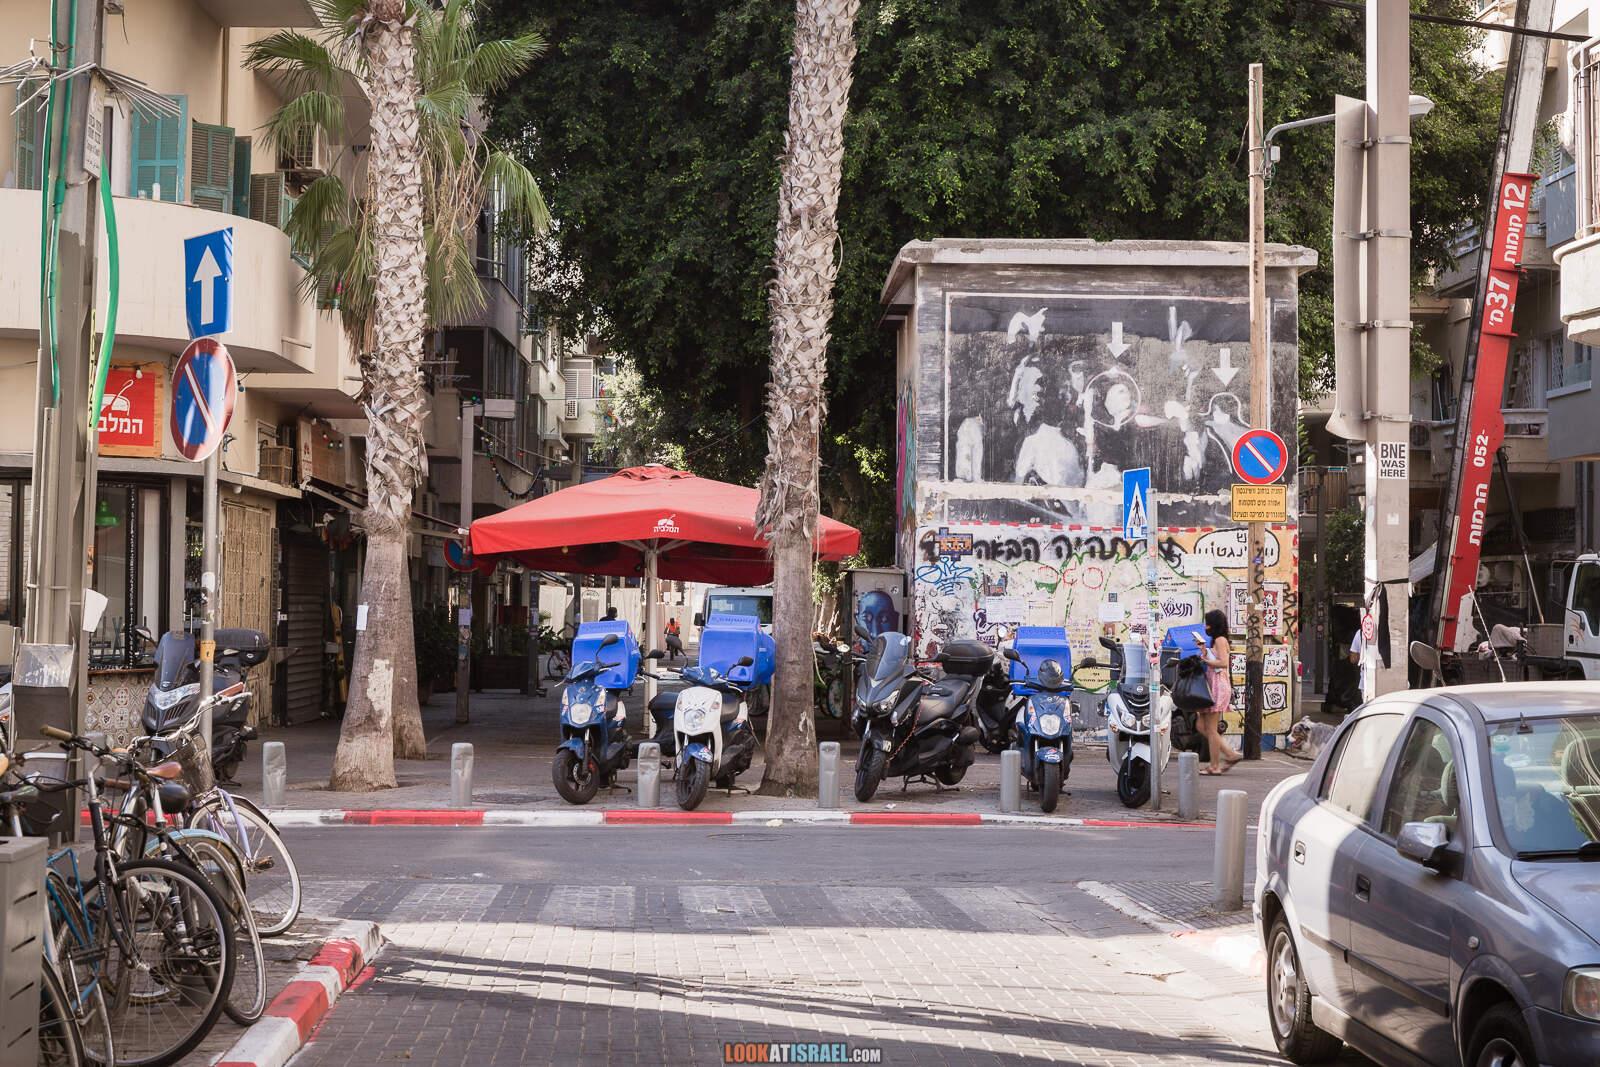 Тель-Авив, квартал Флорентин во время карантина   Lockdown in Florentin of Tel Aviv   LookAtIsrael.com - Фото путешествия по Израилю